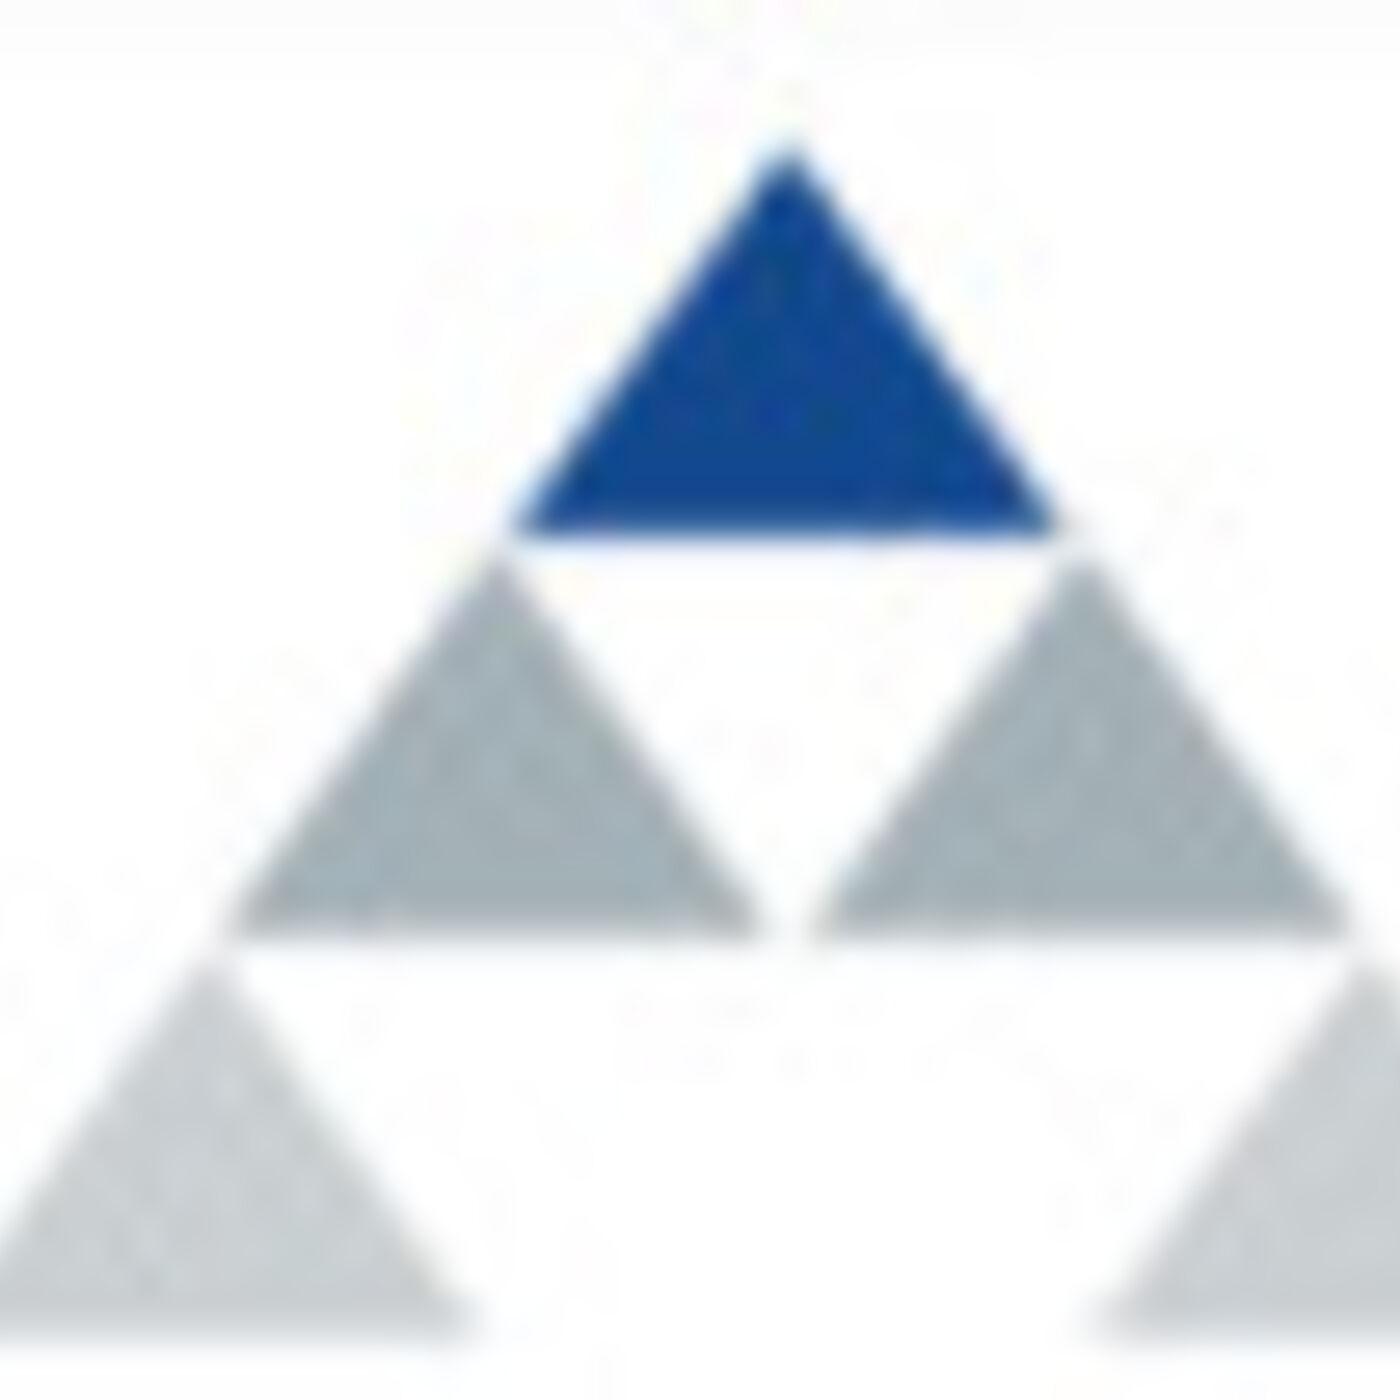 DSTs, Short for Delaware Statutory Trusts